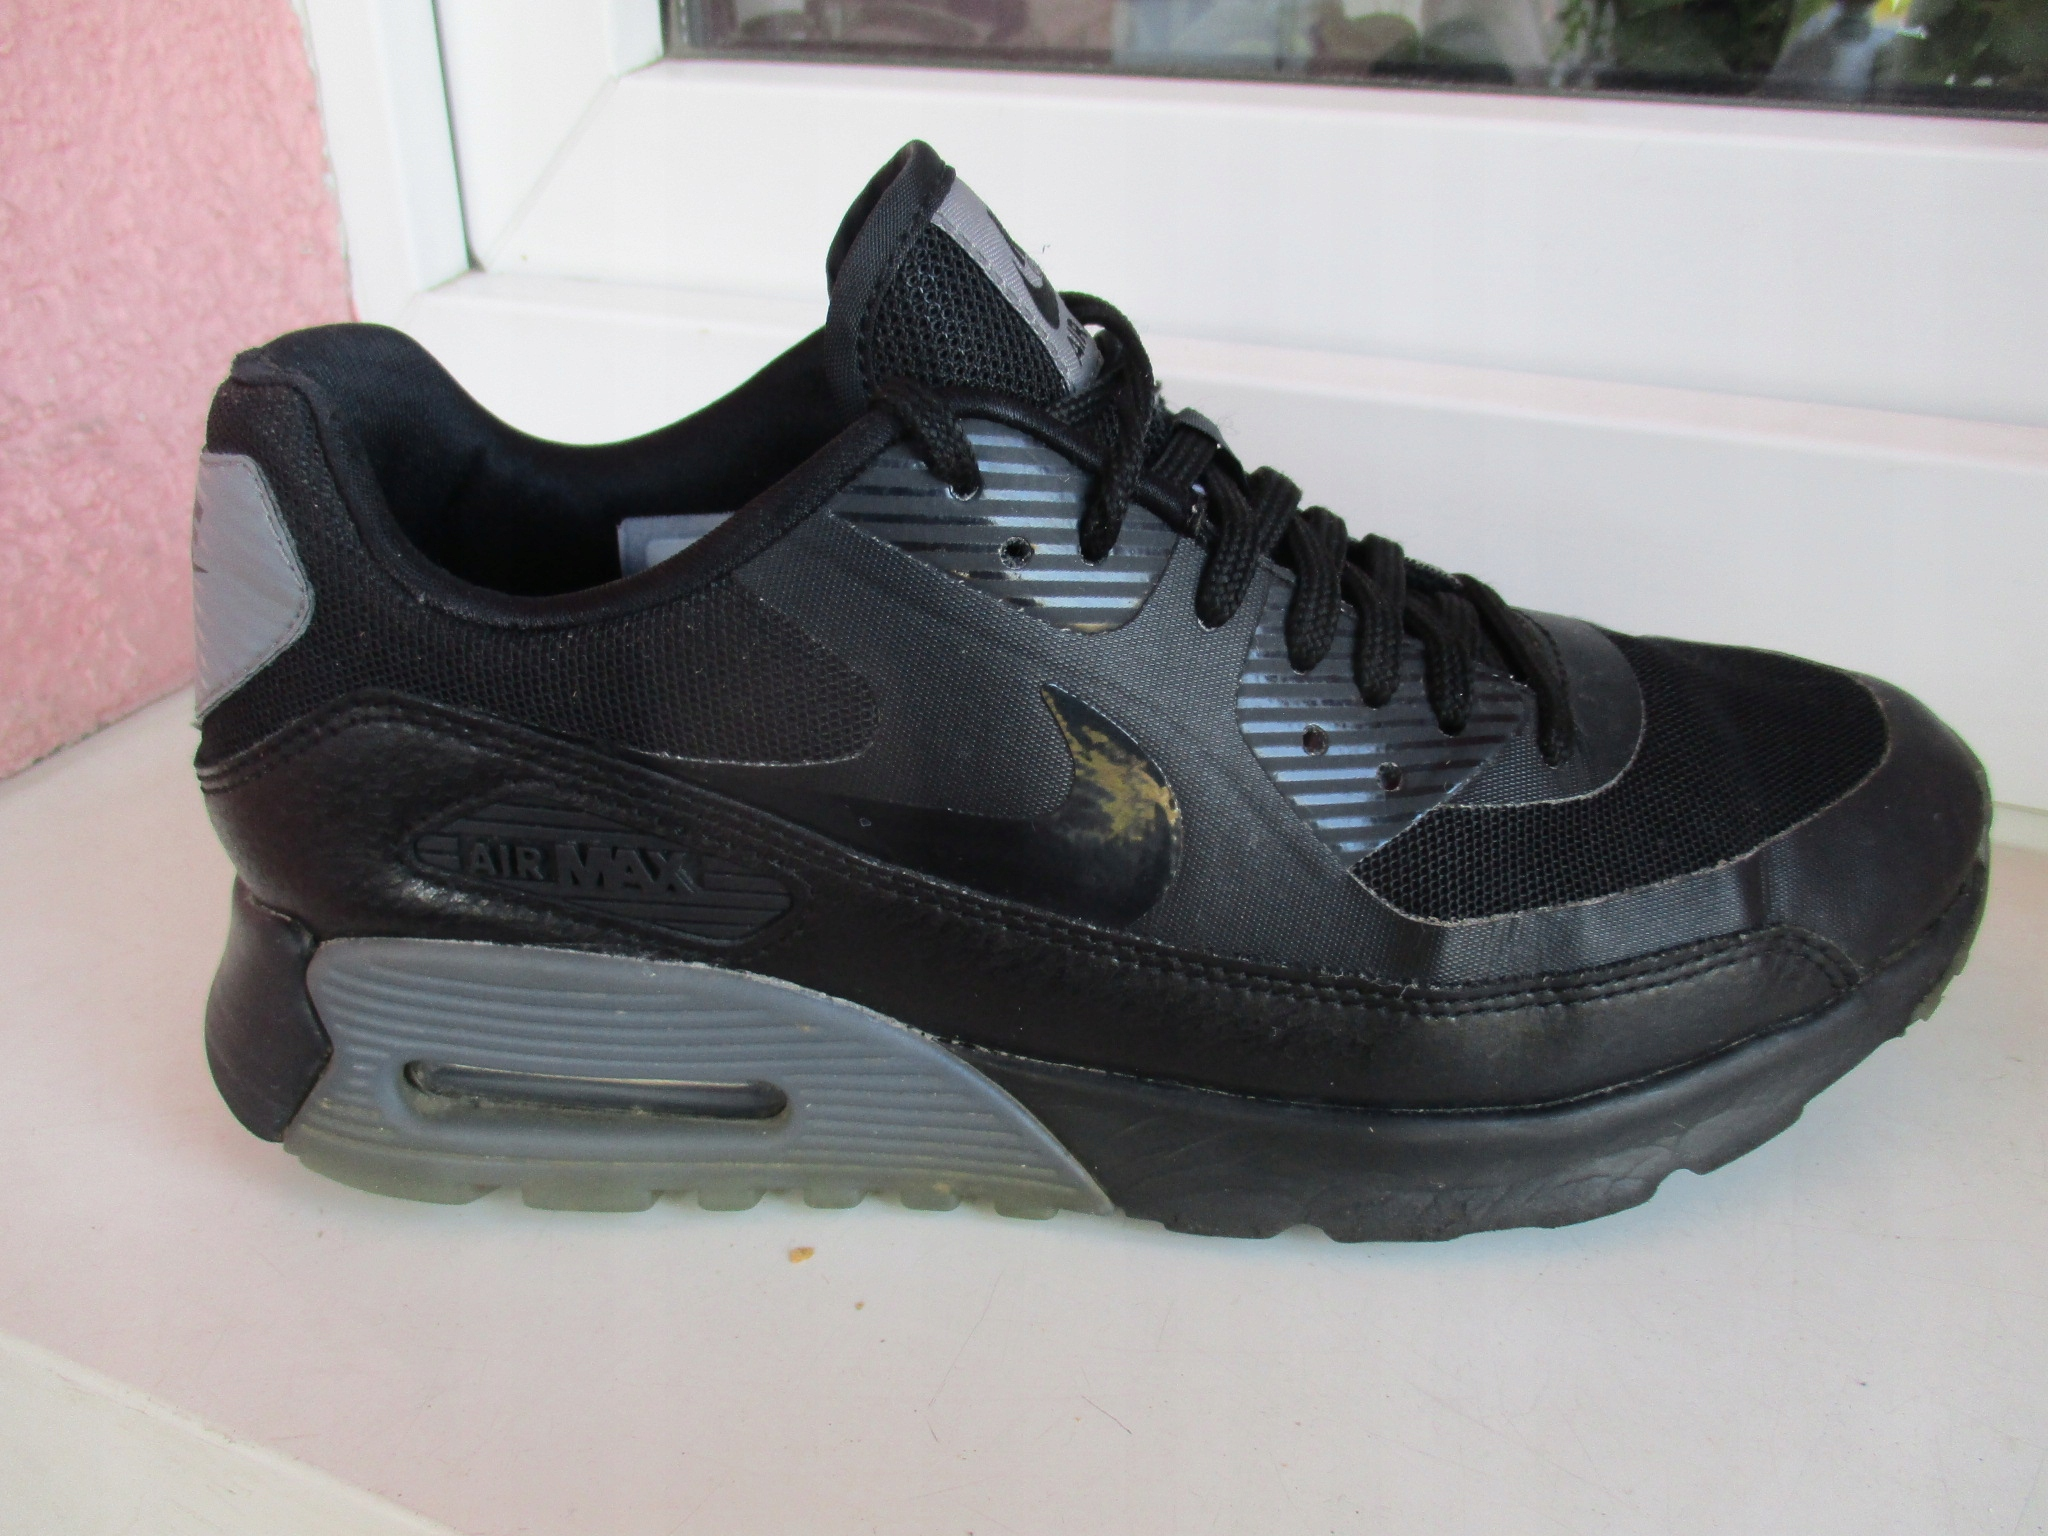 b55ab06fd Buty Nike Air max 90 Ultra czarne r. 38 * - 7692302670 - oficjalne ...